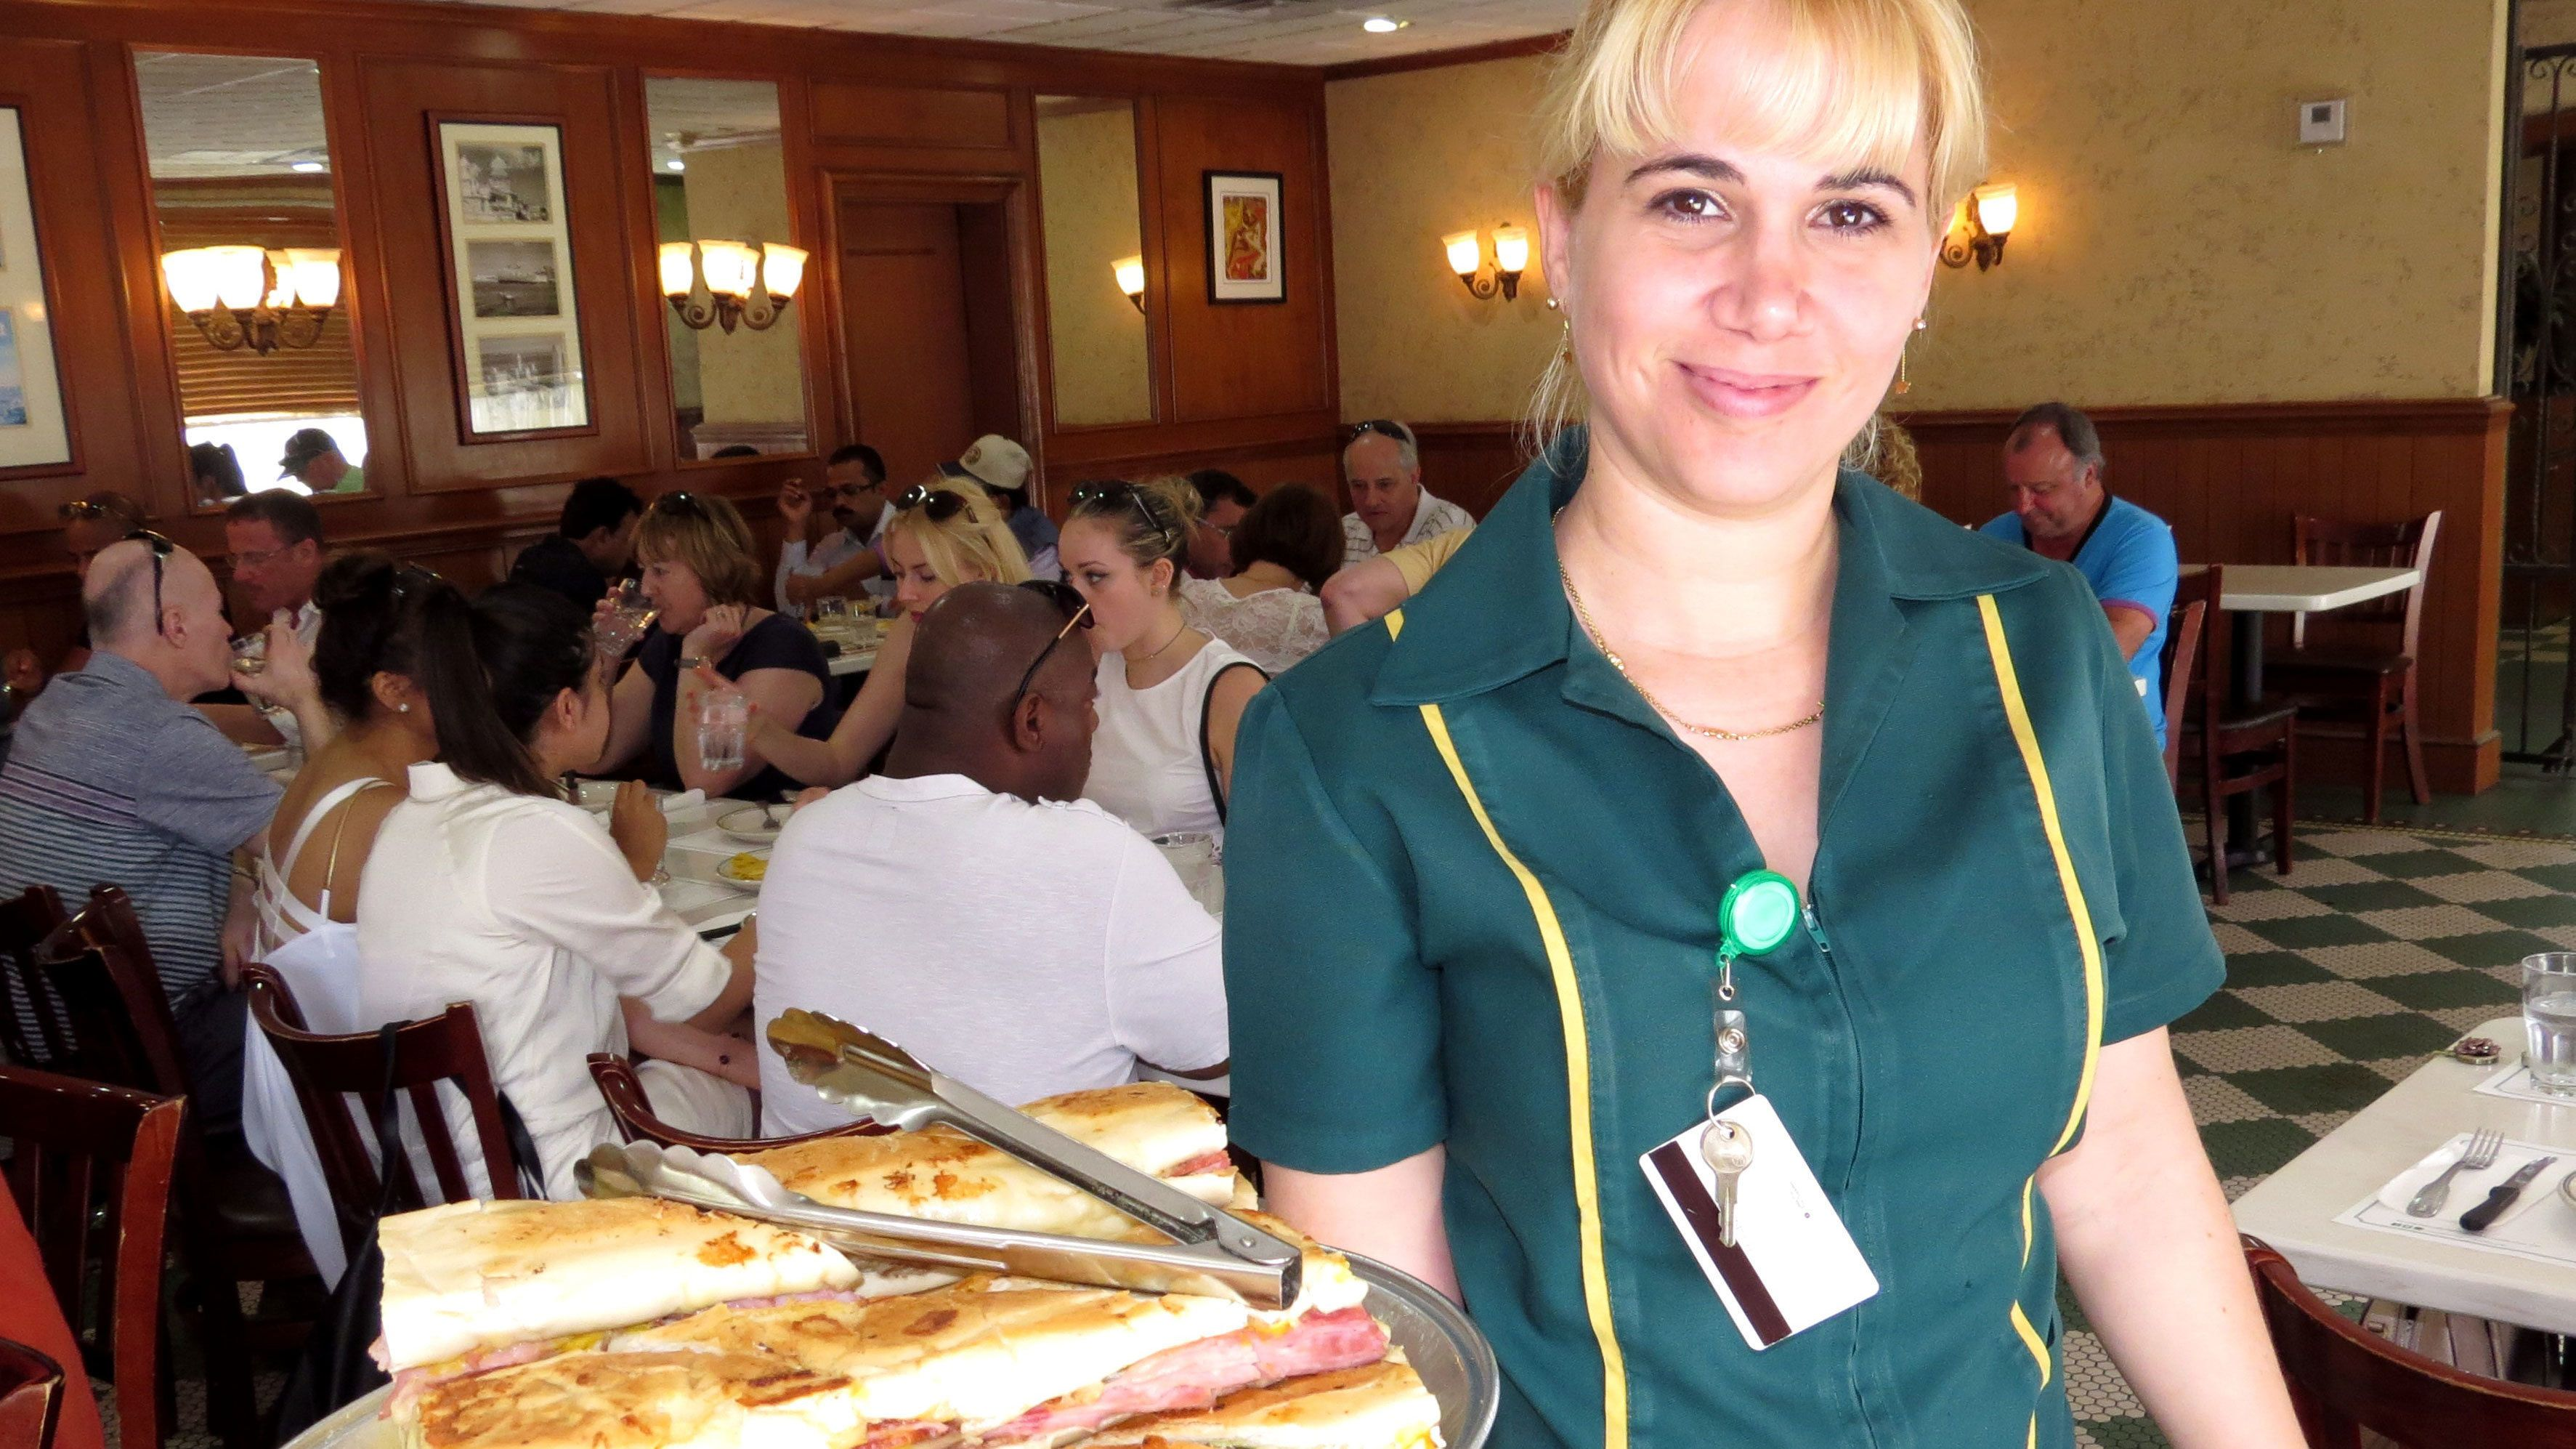 Server in a Cuban restaurant